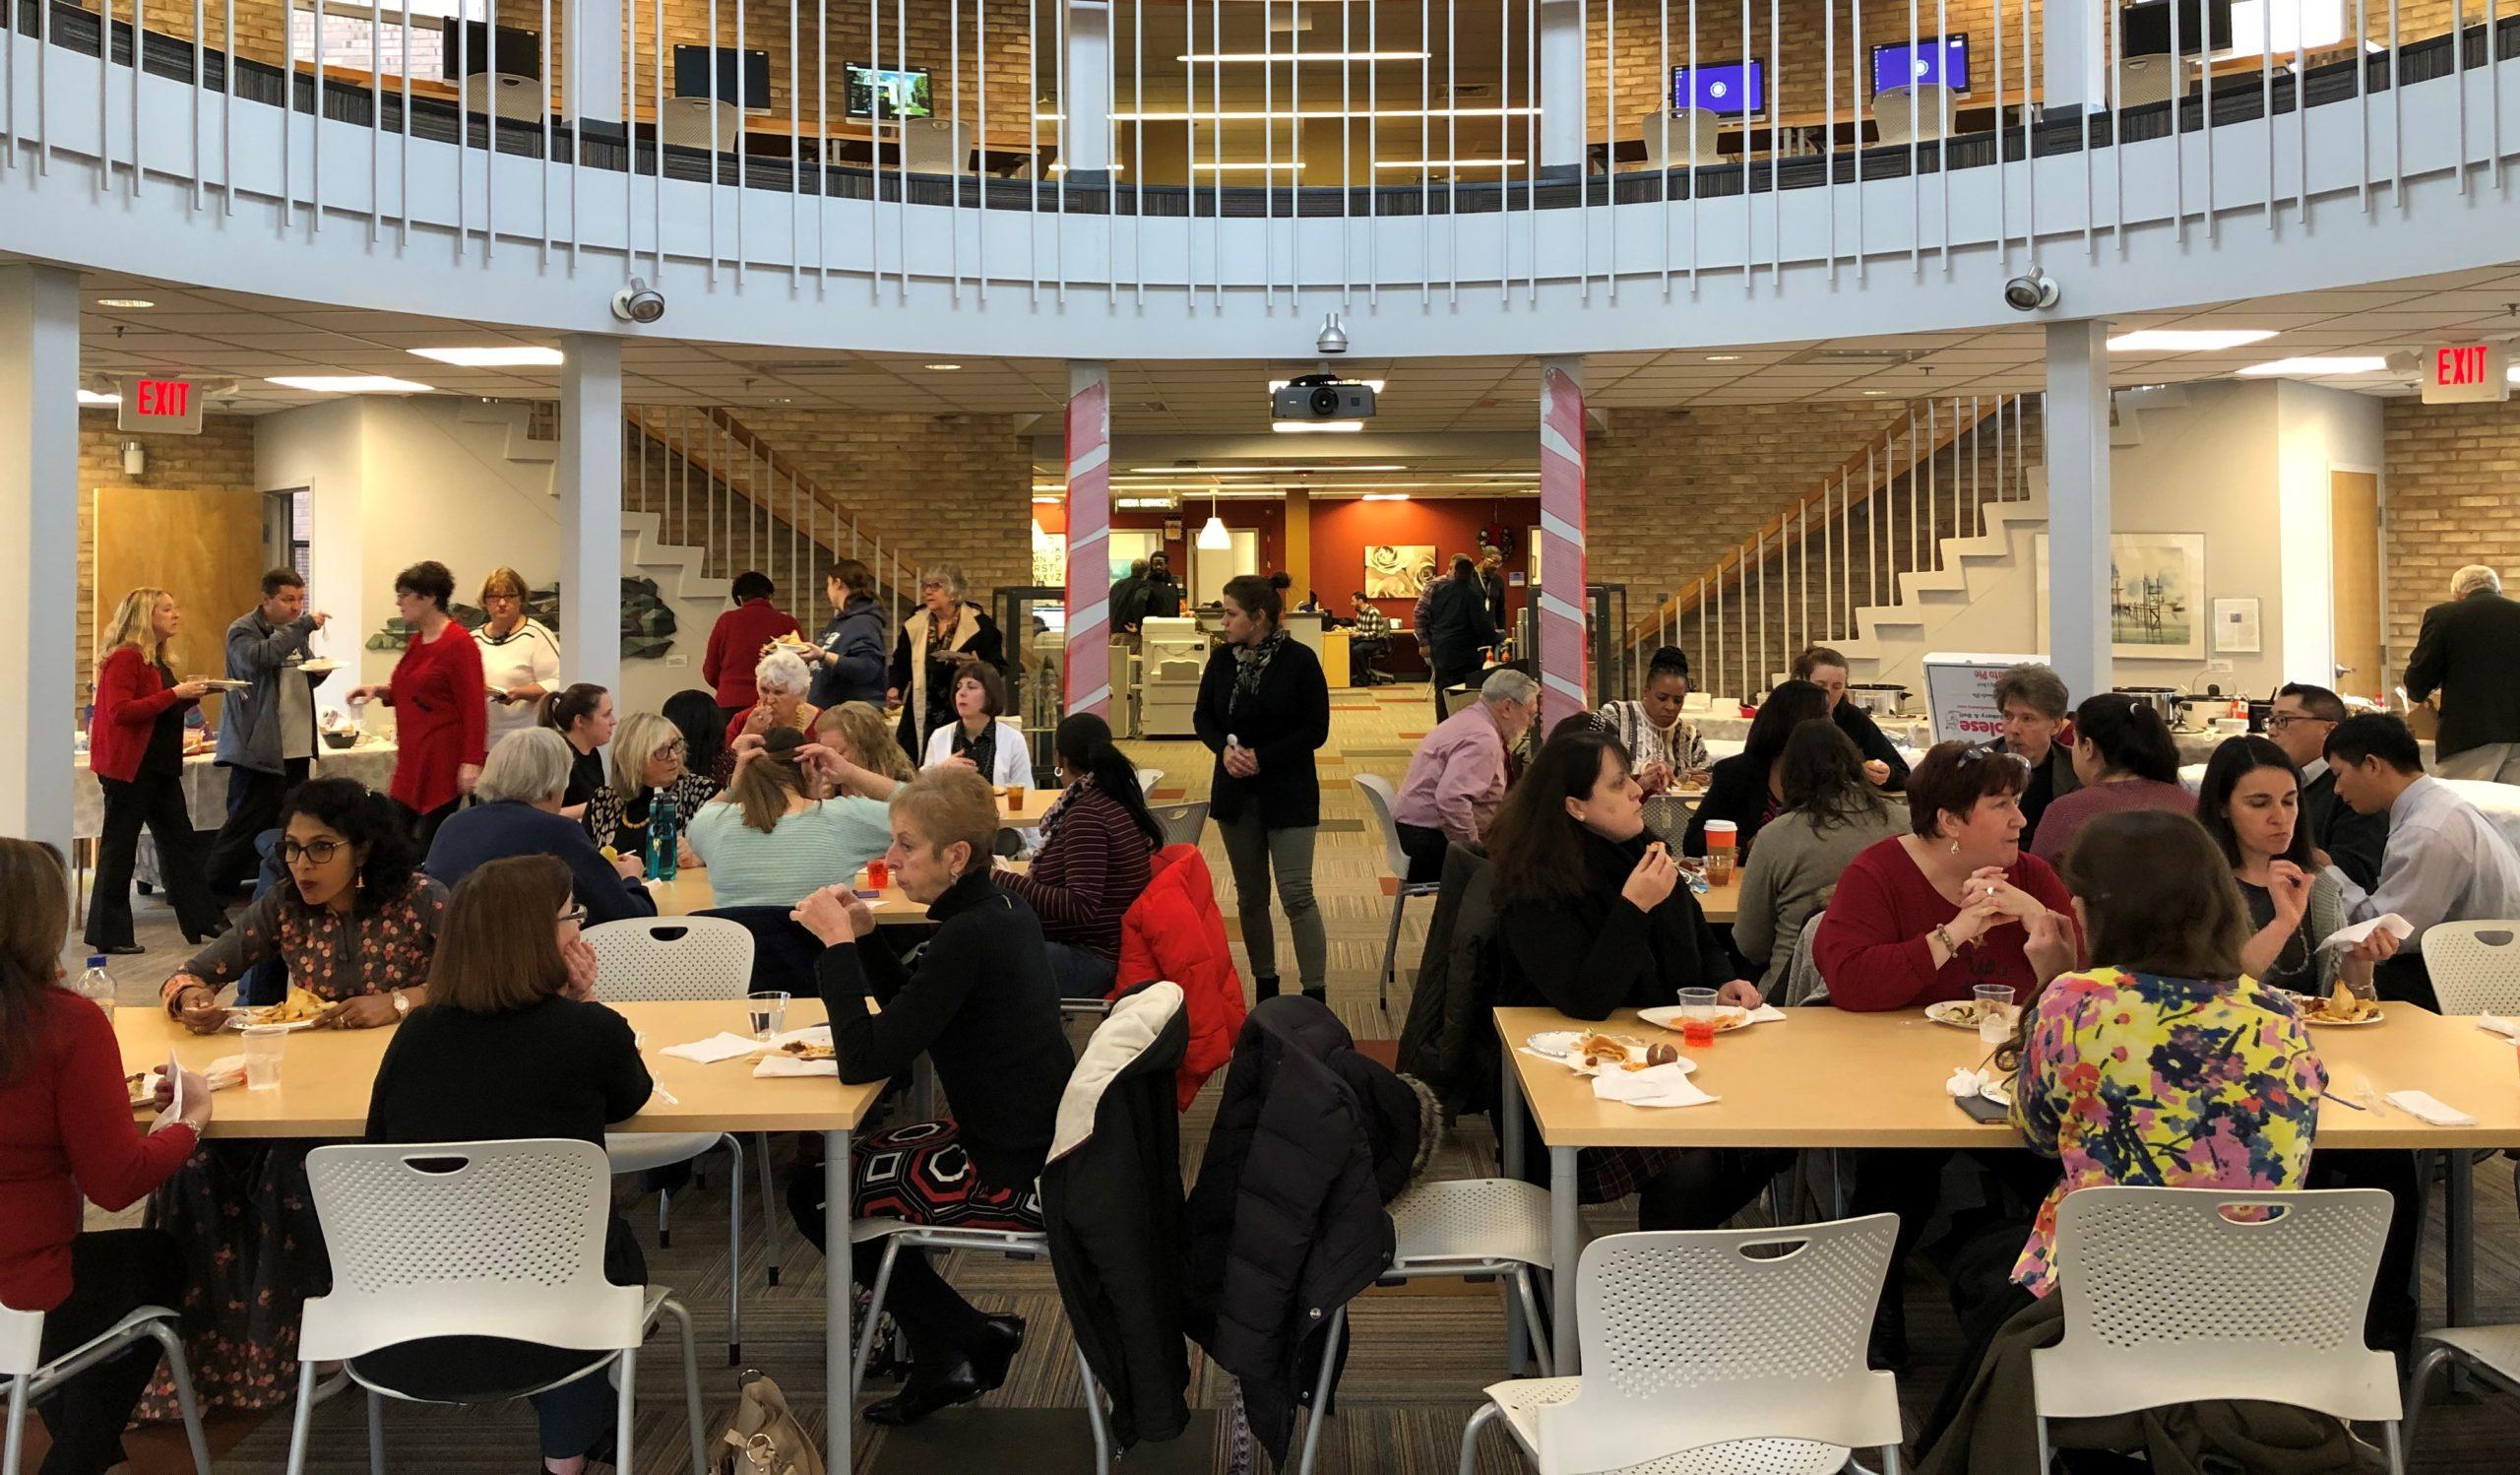 Harcum Trades College-Sponsored Banquet for Holiday Potluck, Donation to Philabundance